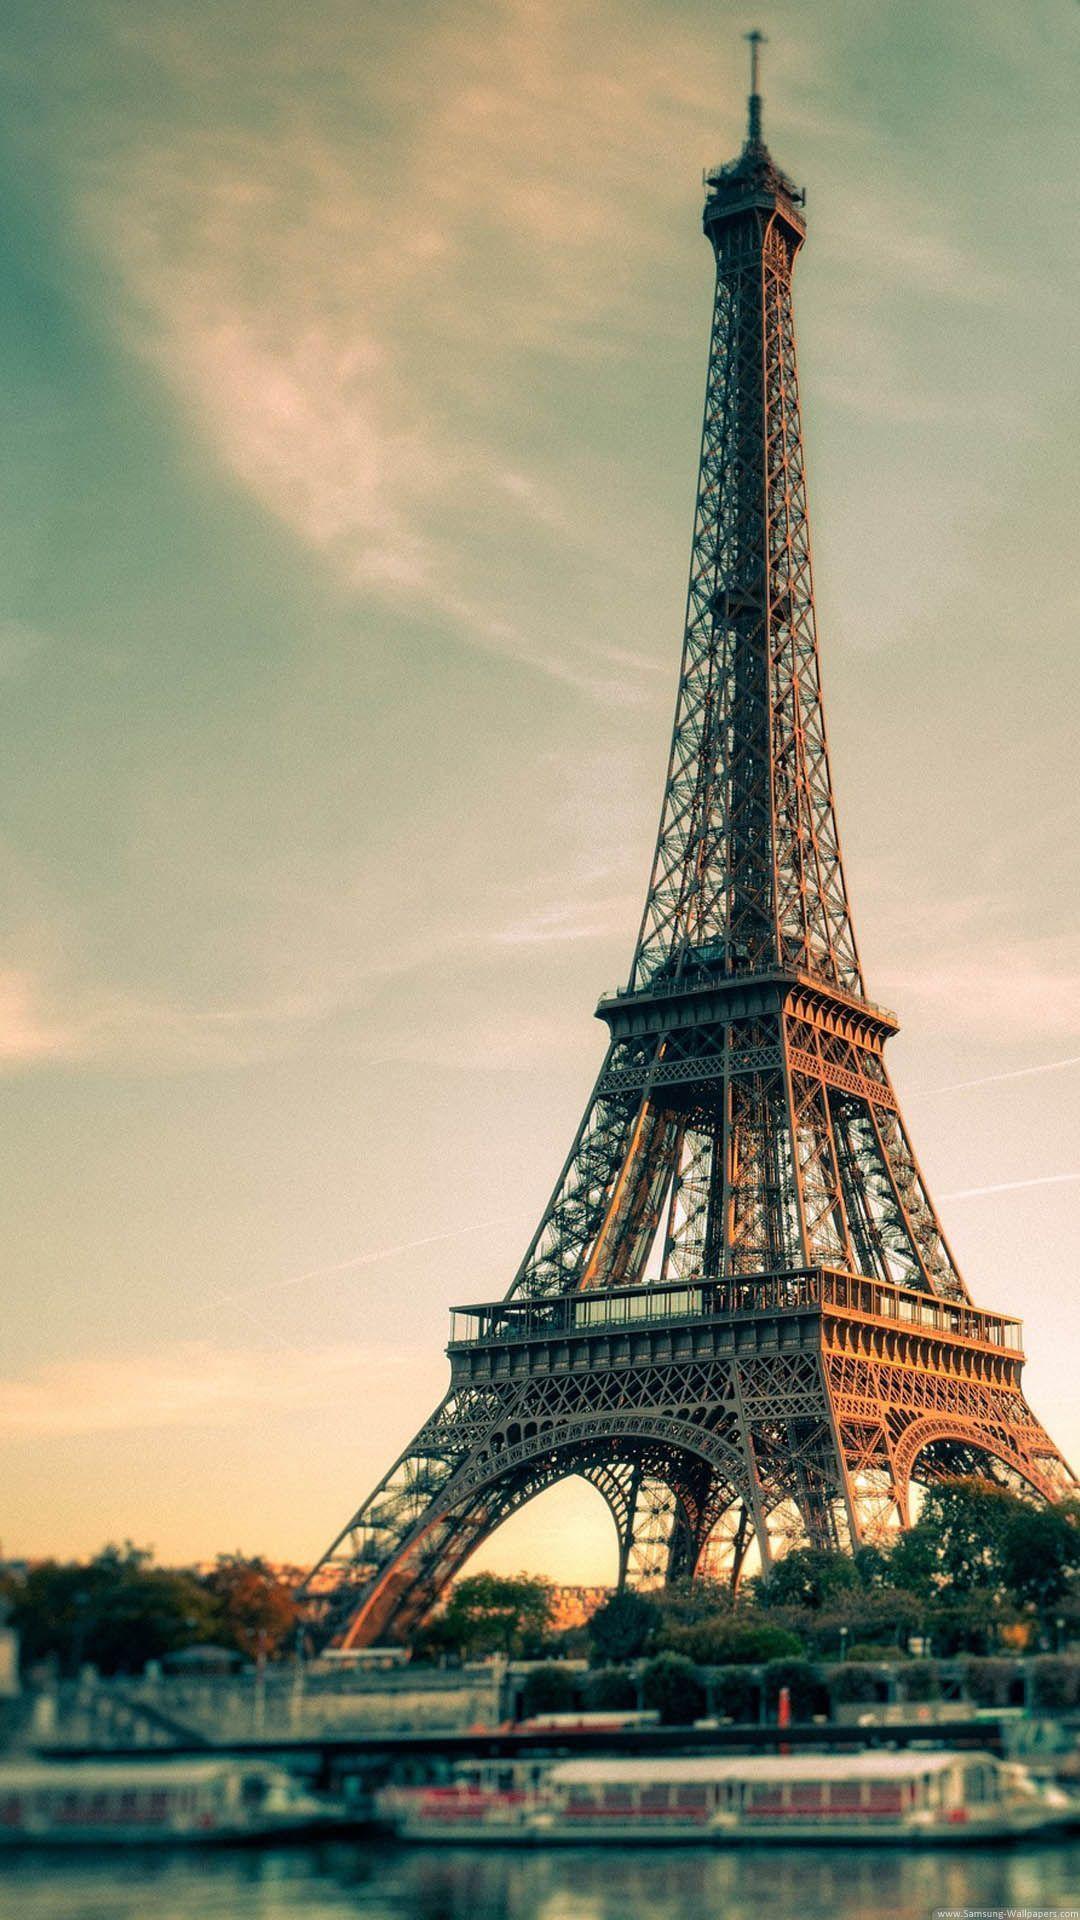 Paris iPhone wallpapers, Los Angeles iPhone wallpapers